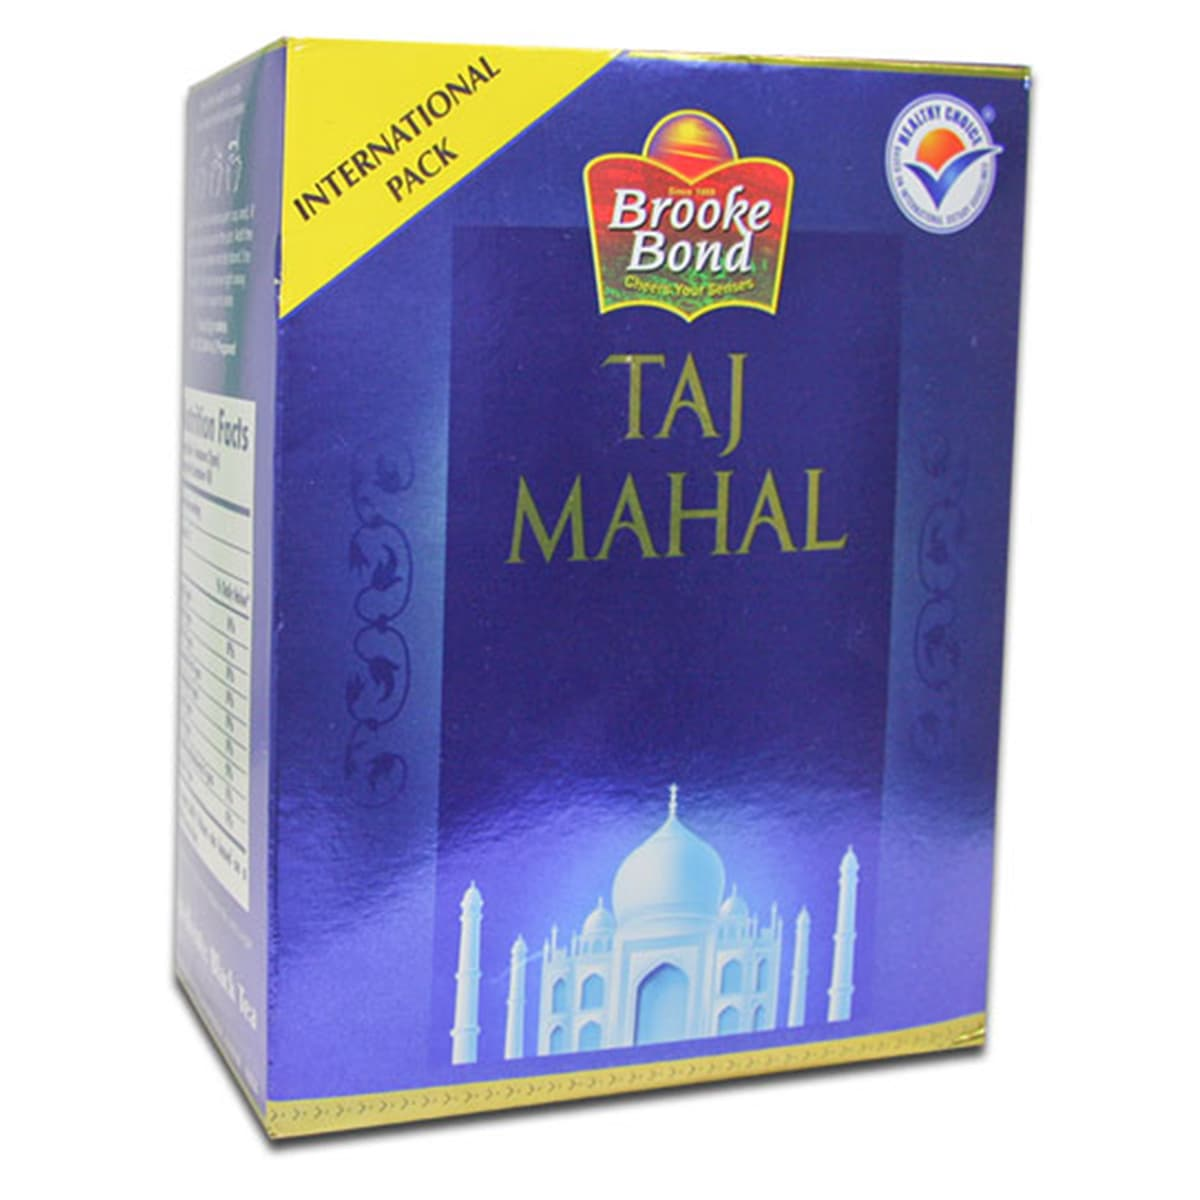 Buy Brooke Bond Taj Mahal Tea (Loose Tea) - 900 gm